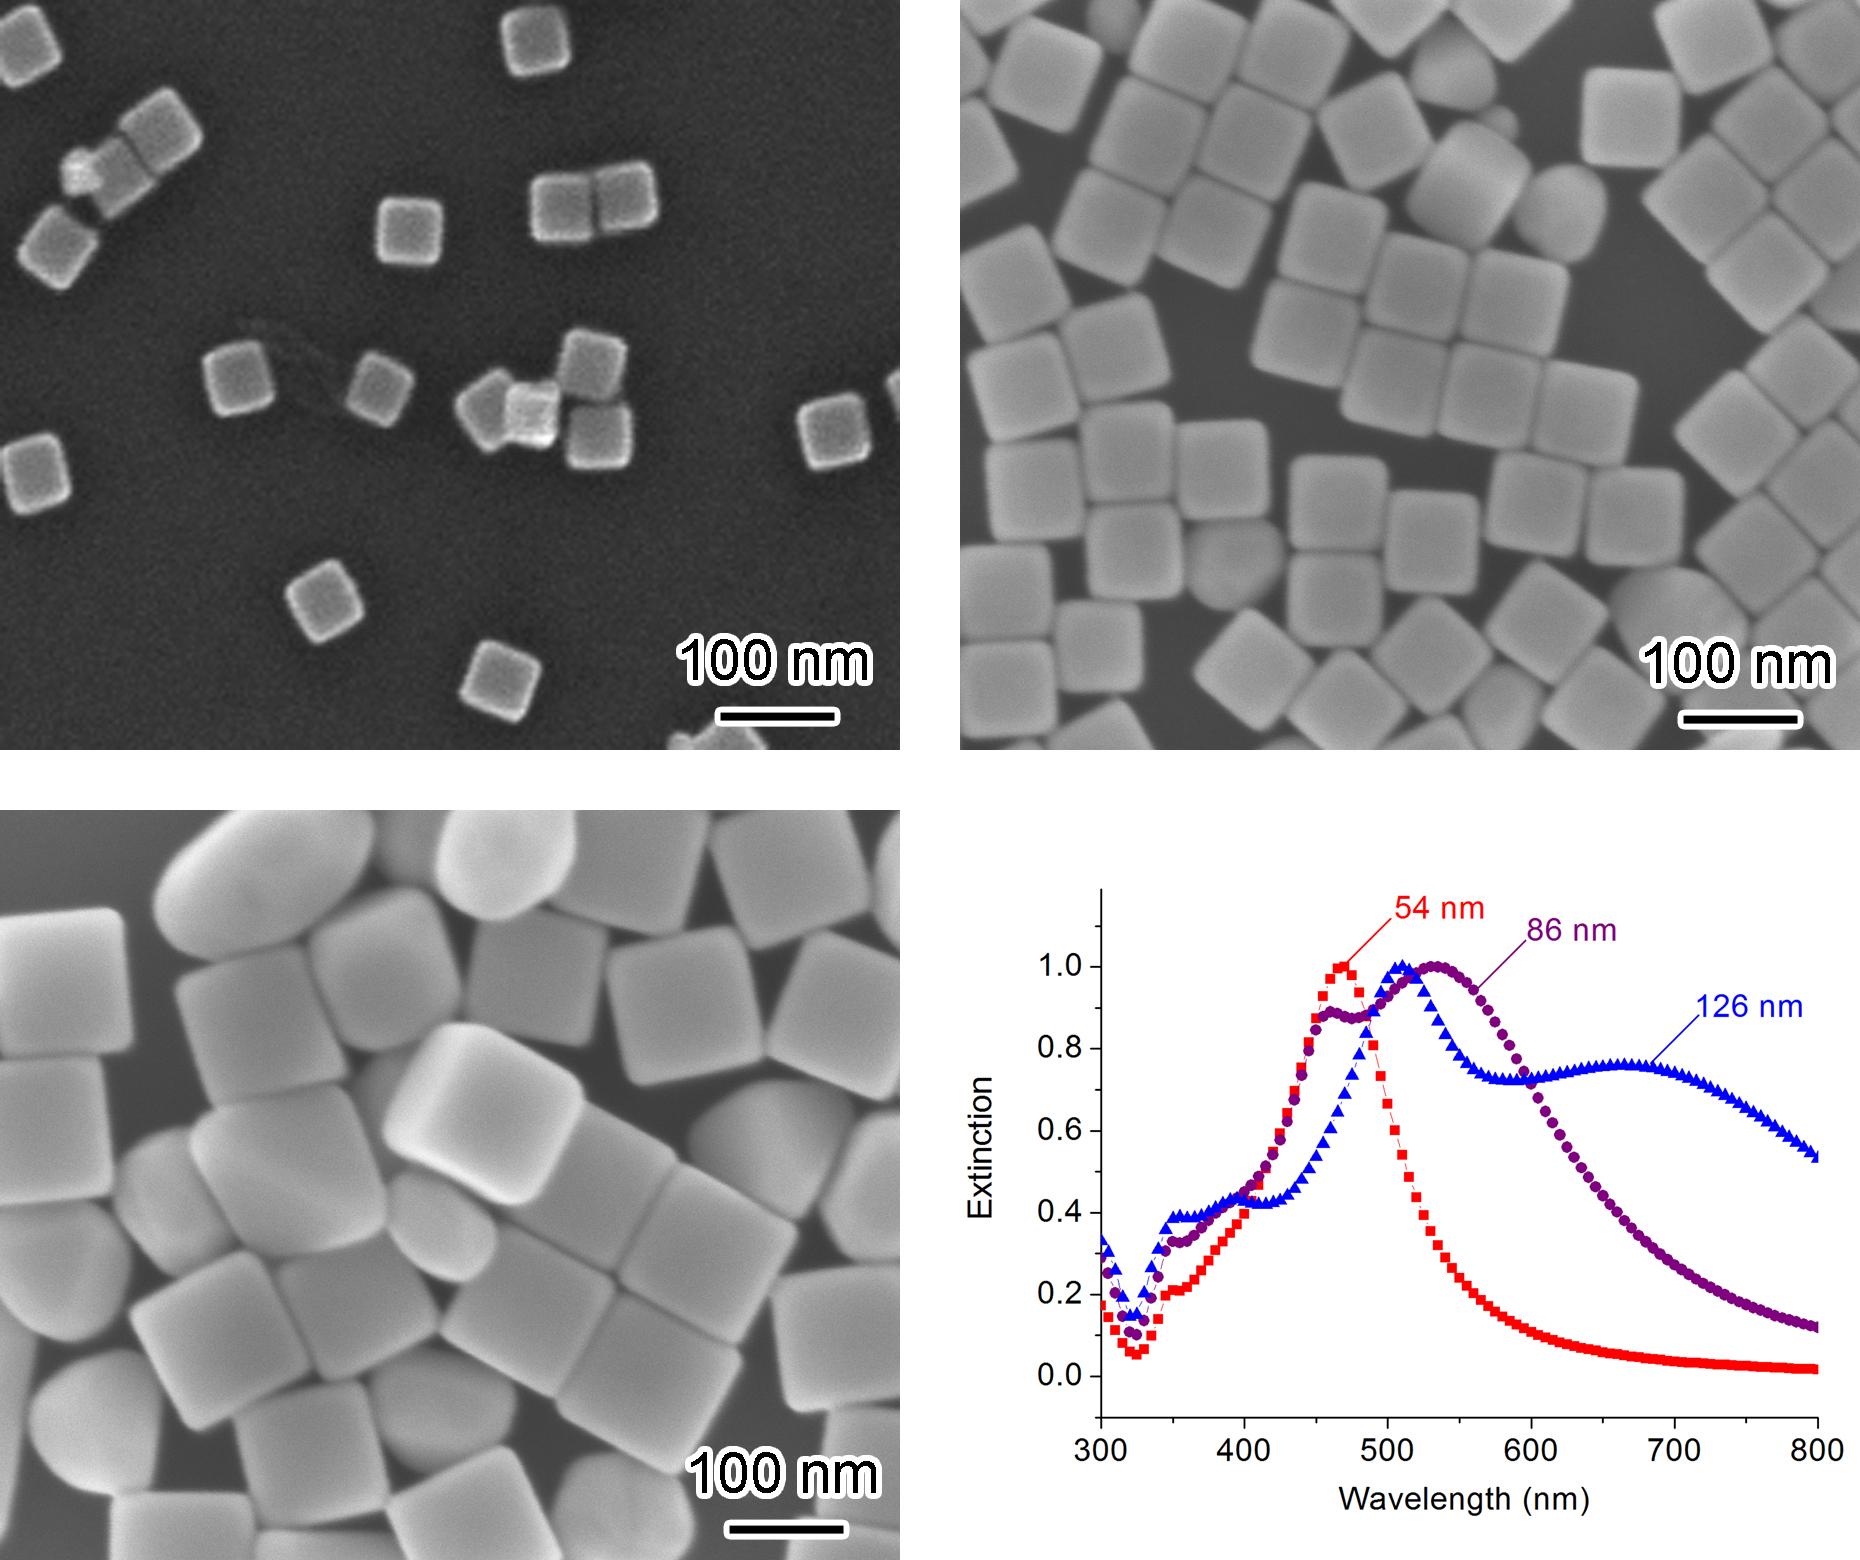 upconverting nanoparticles